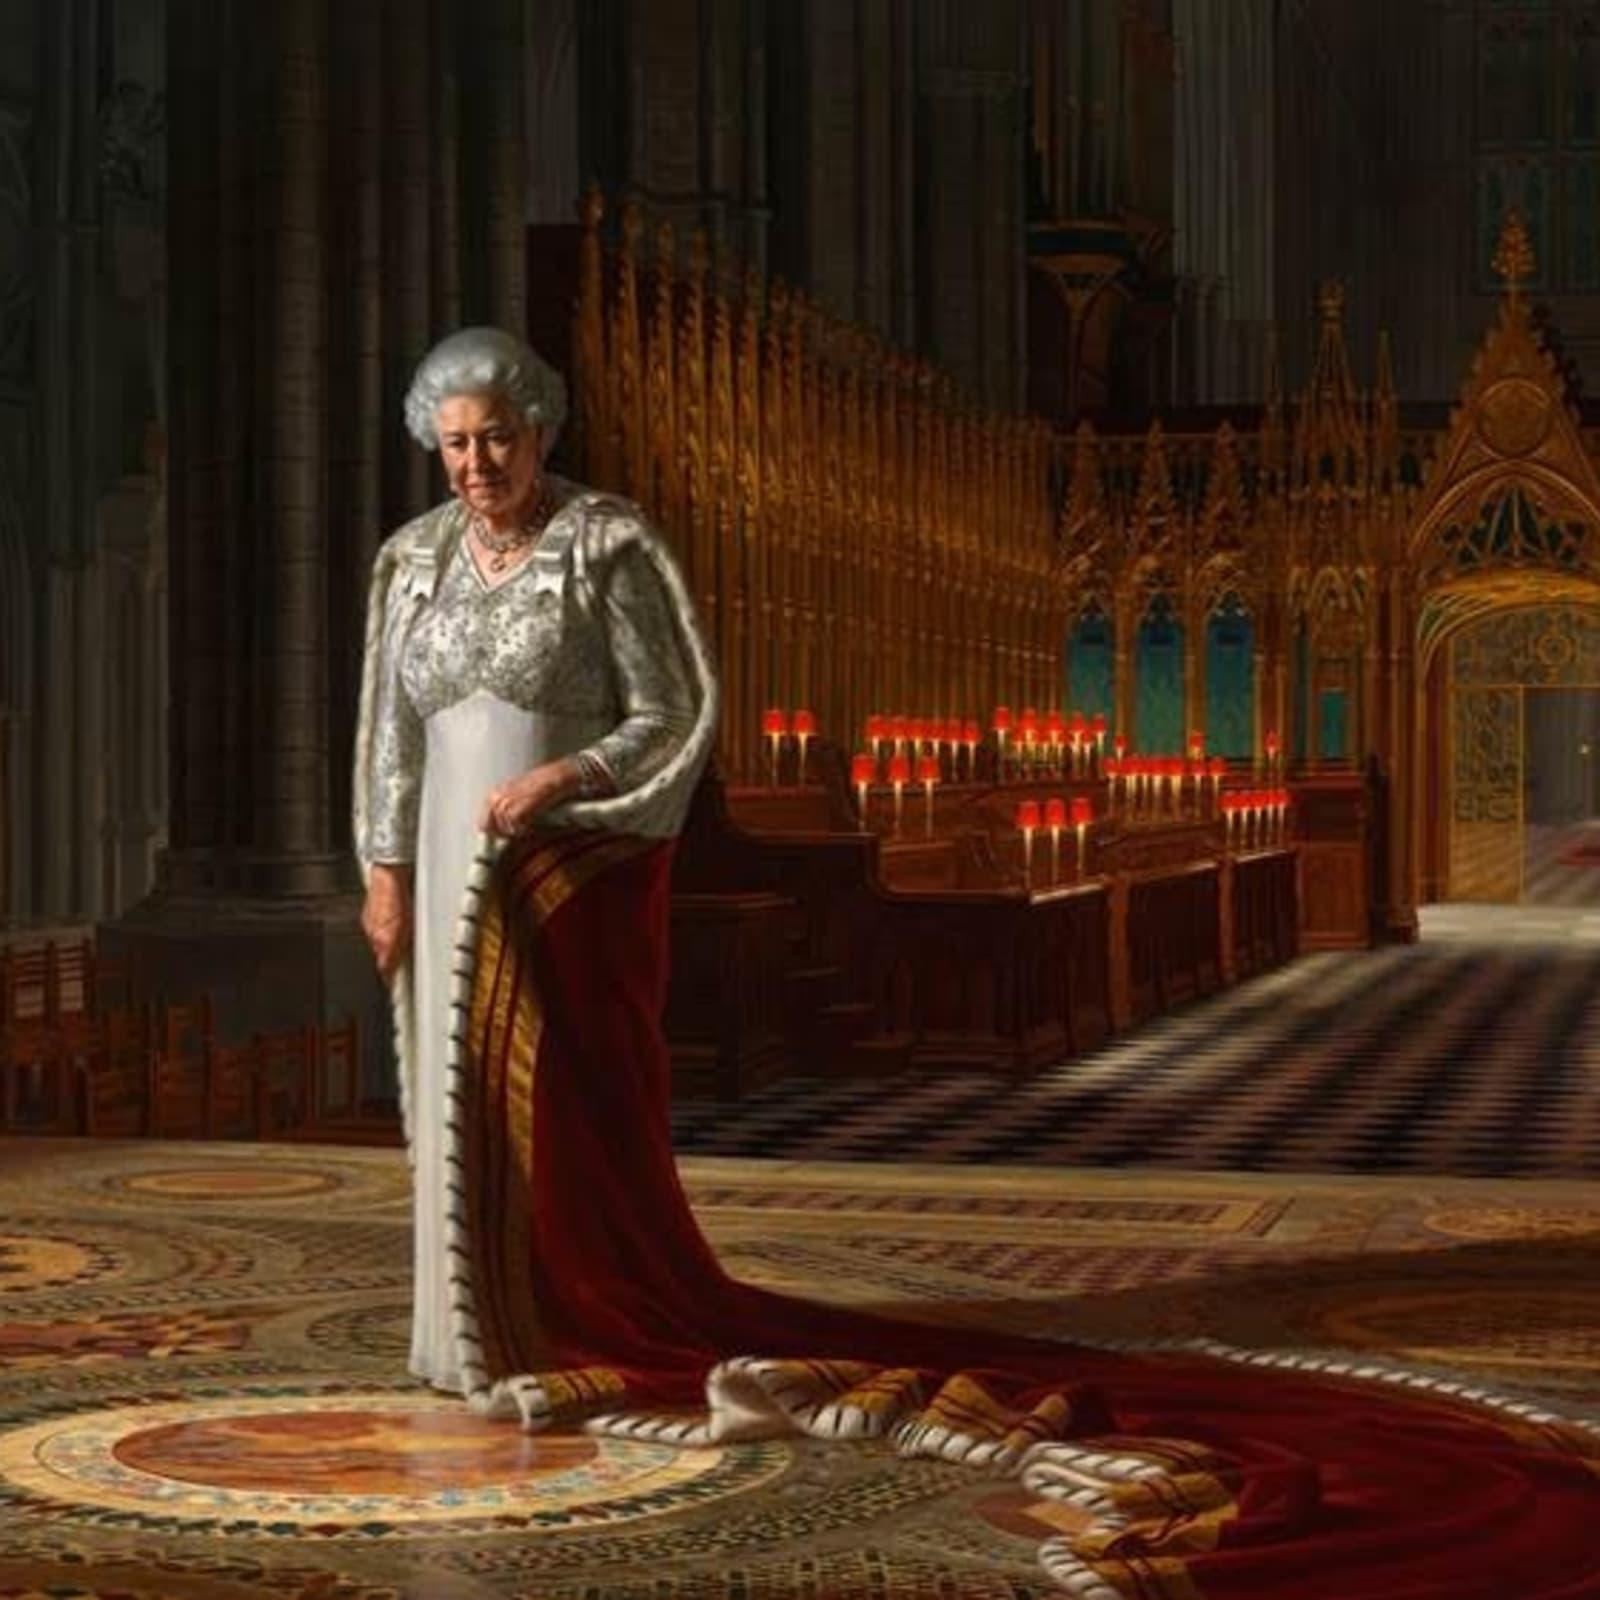 Ralph Heimans, The Coronation Theatre: Her Majesty Queen Elizabeth II, 2013 Oil on canvas, 250 x 342 cm © Ralph Heimans